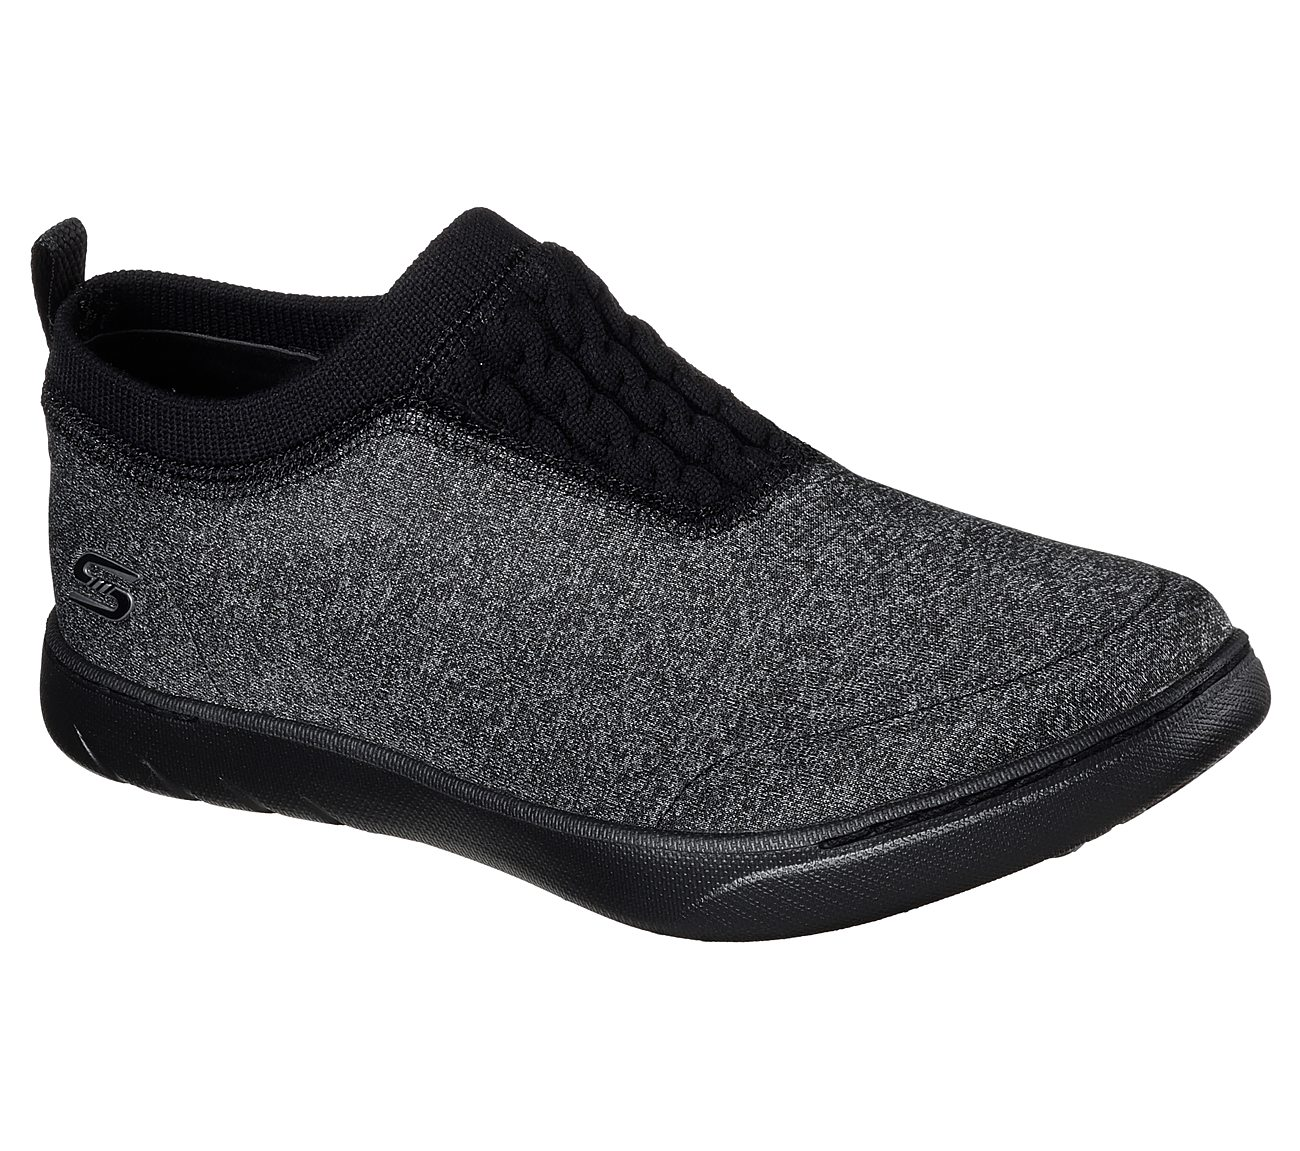 Skechers Women/'s Slip On Casual Shoes Millennial Light Storm 23539 Black//White